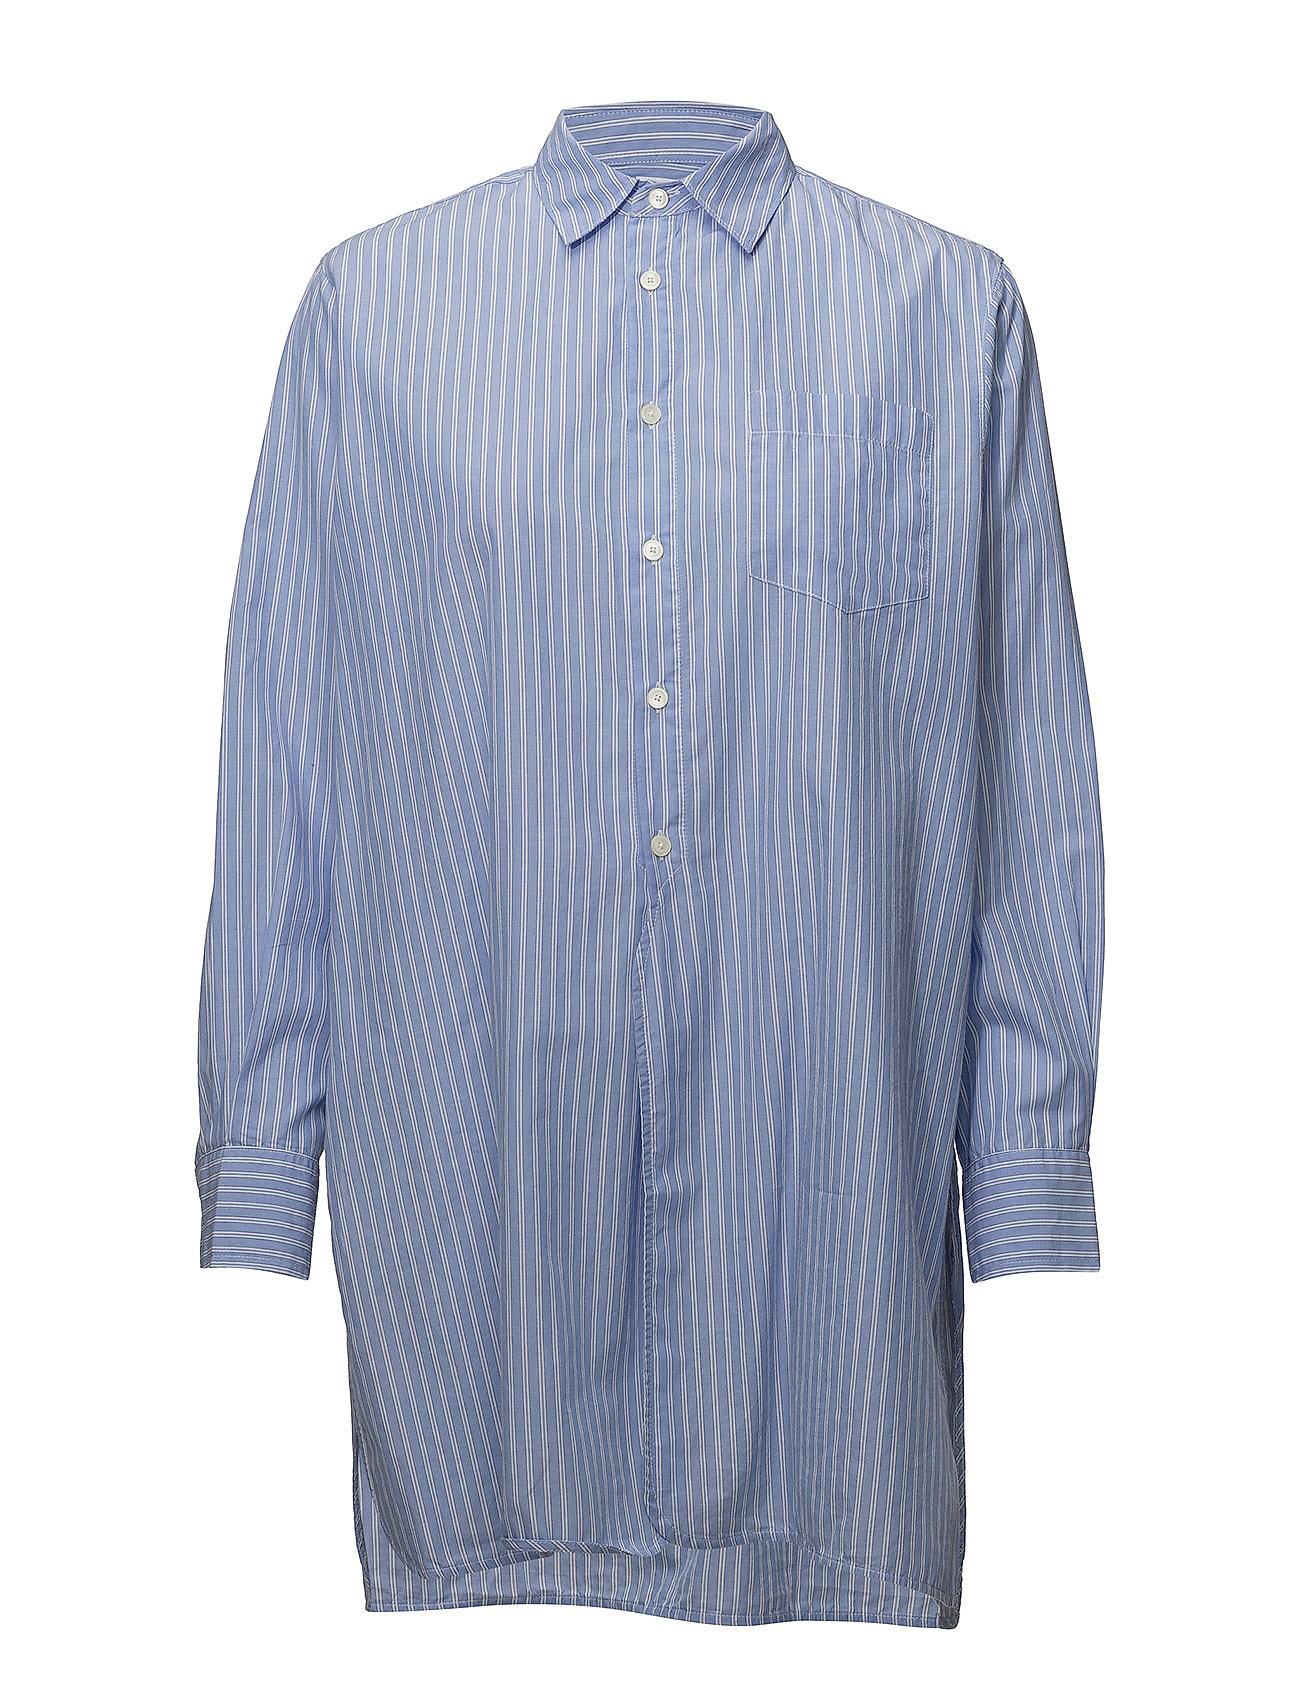 Hope Coast Shirt - BLUE STRIPE